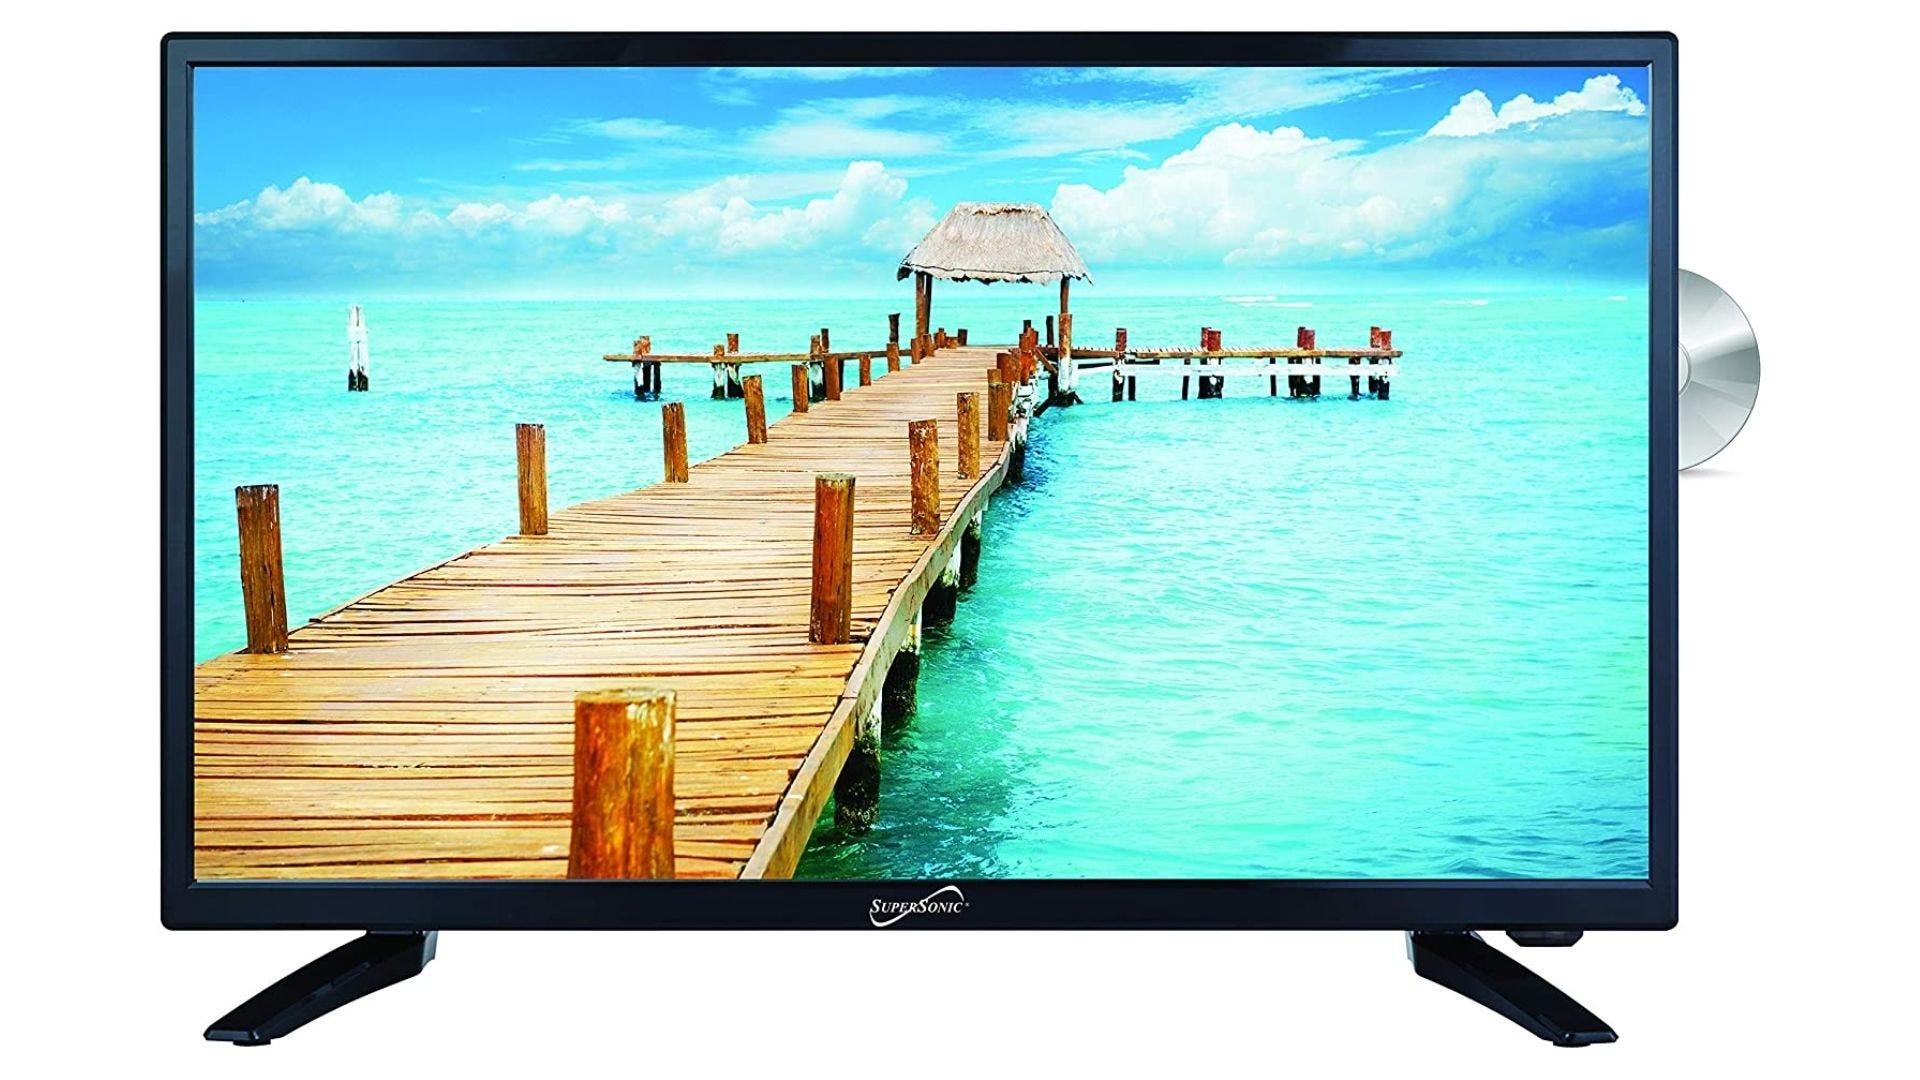 SuperSonic SC-2412 LED cu ecran lat HDTV